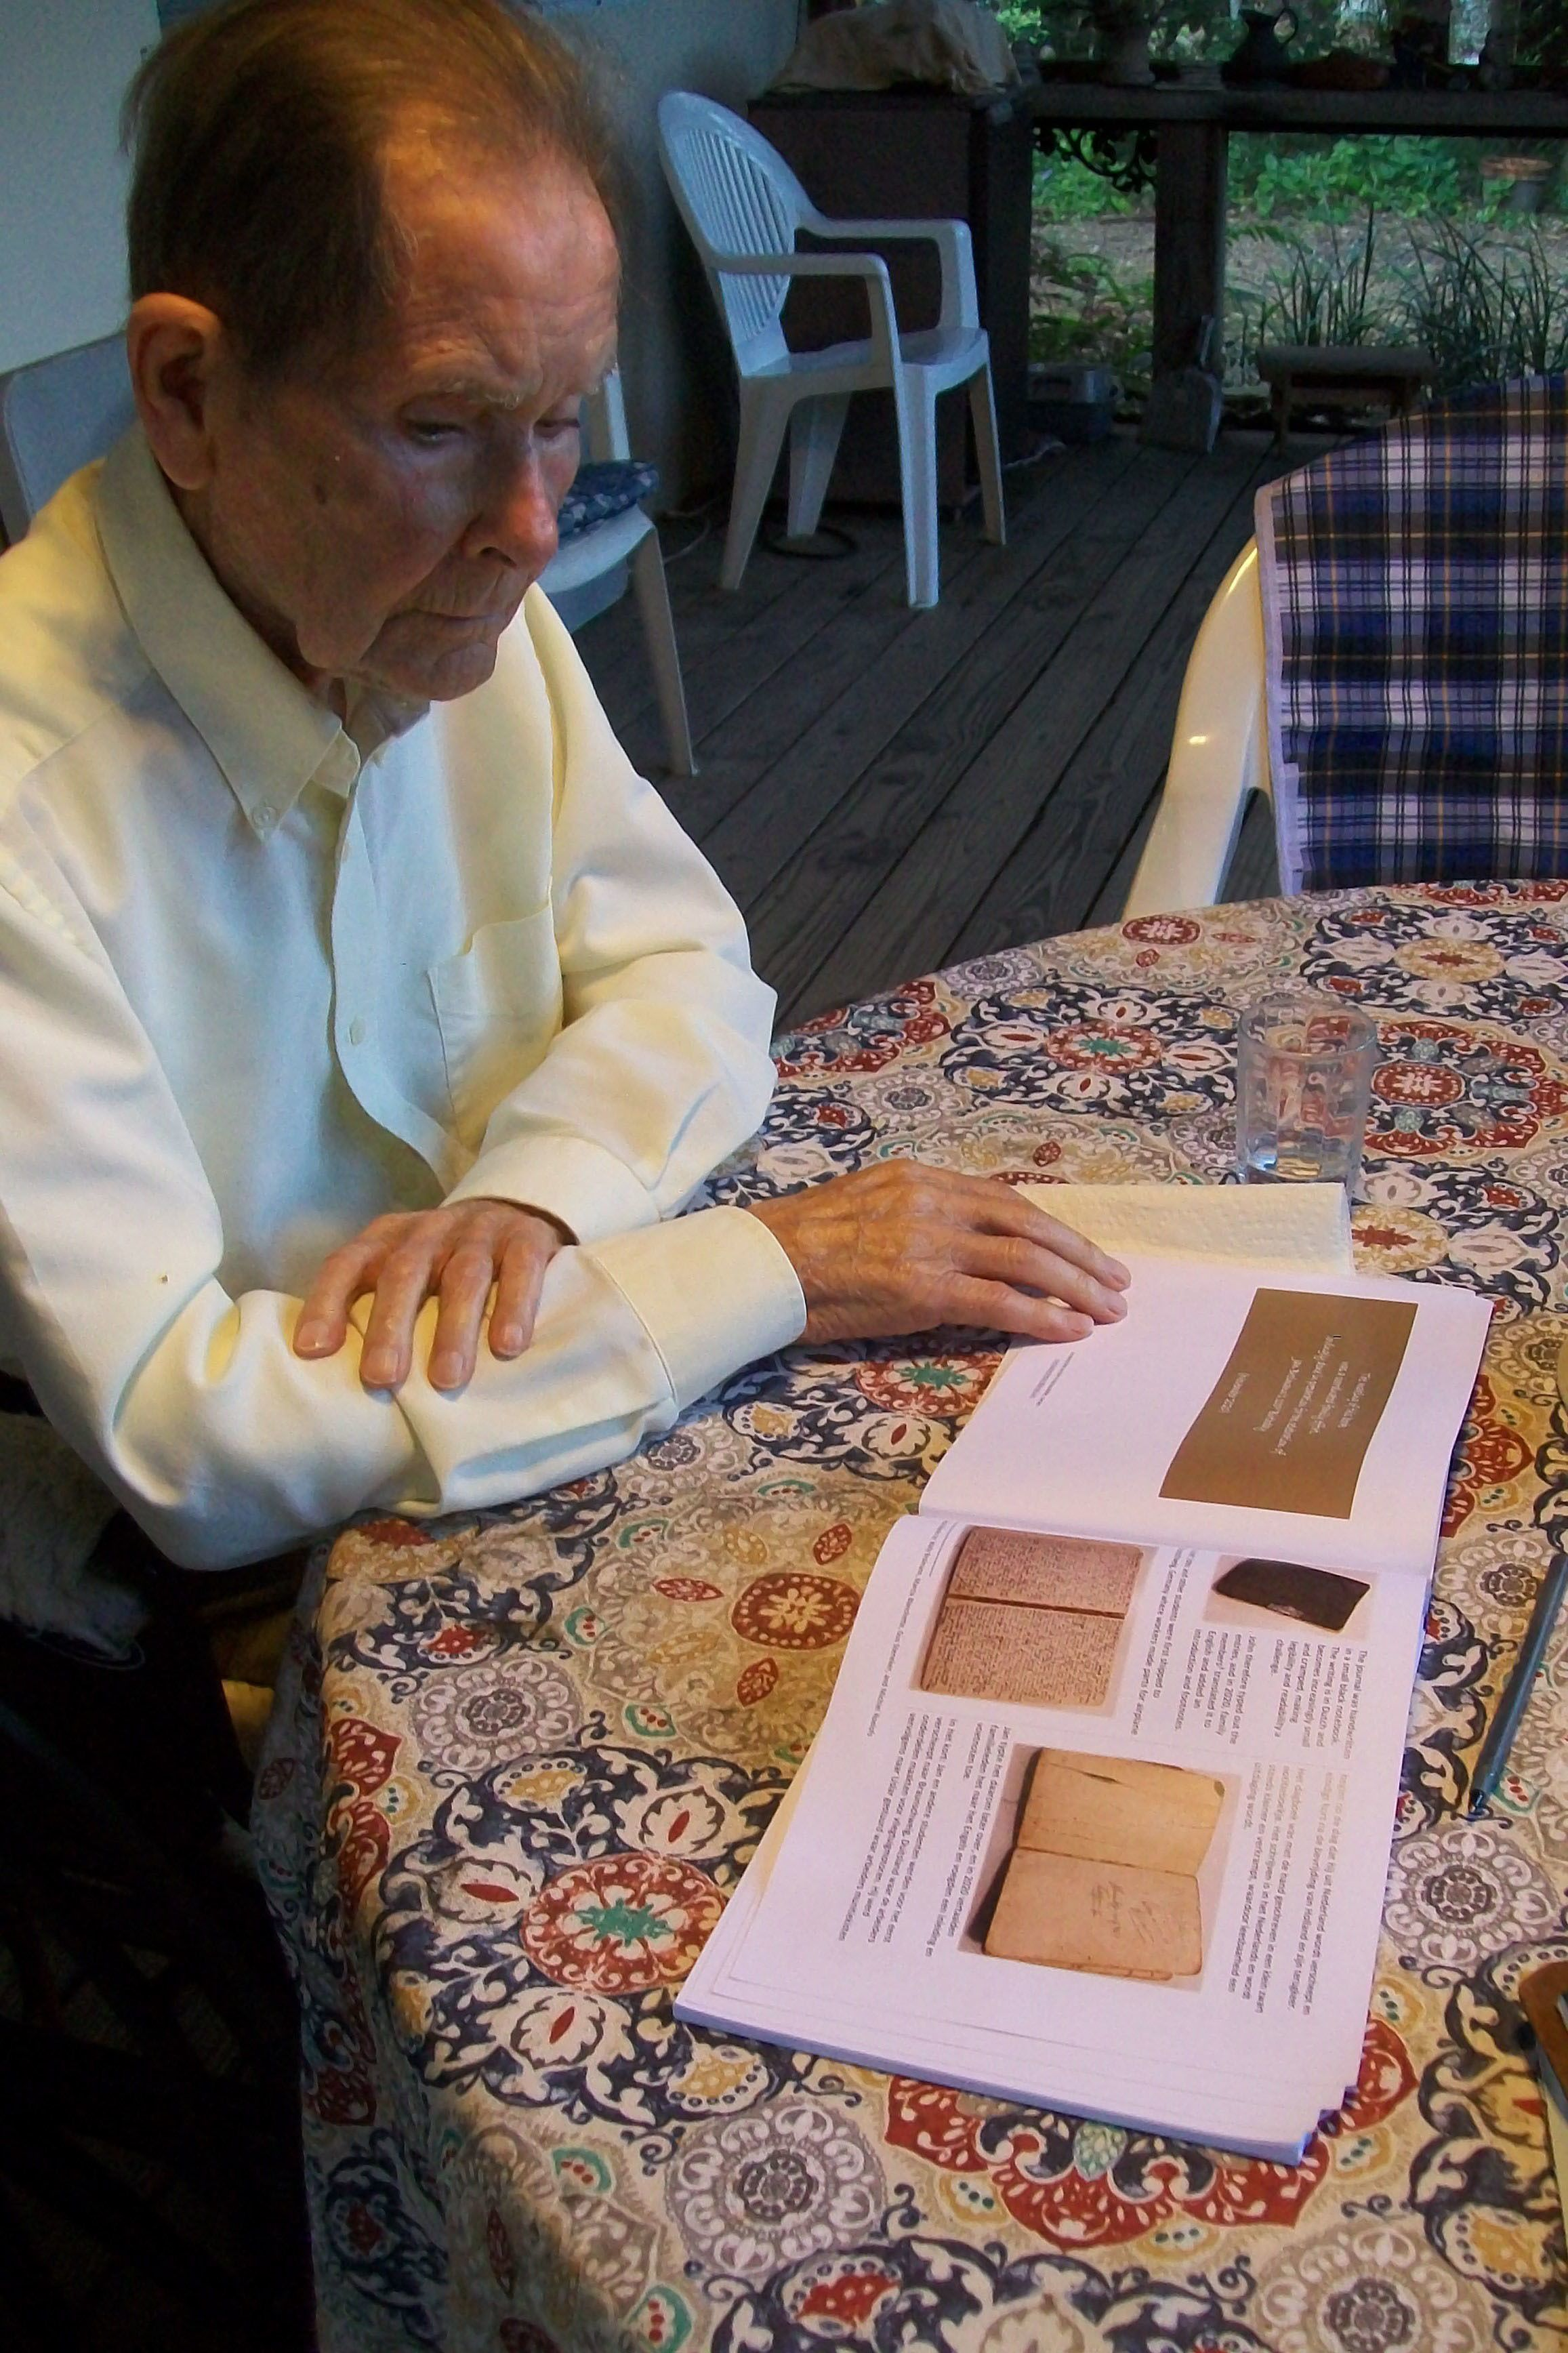 Centenarian's faith was a lifeline during Nazi invasion